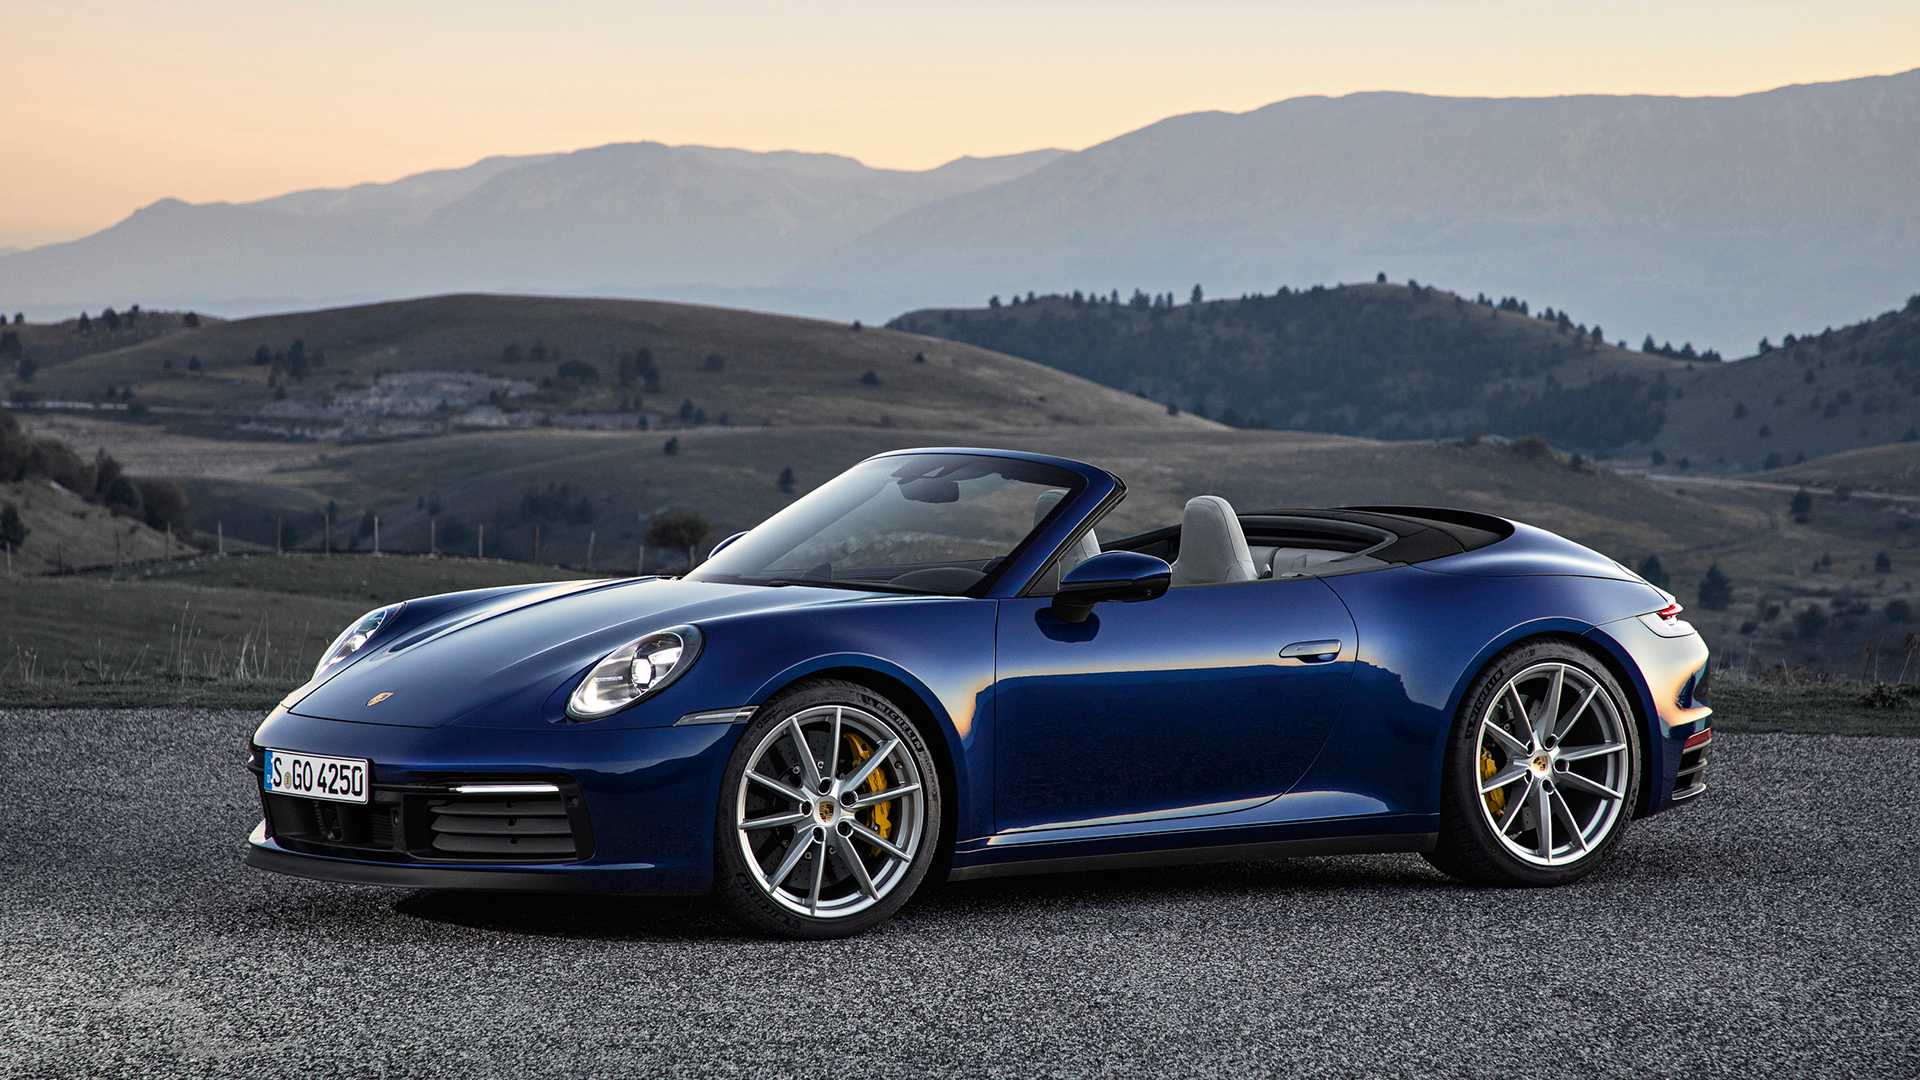 2020 Porsche 911 Cabriolet Debuts With 443 Hp Unlimited Headroom